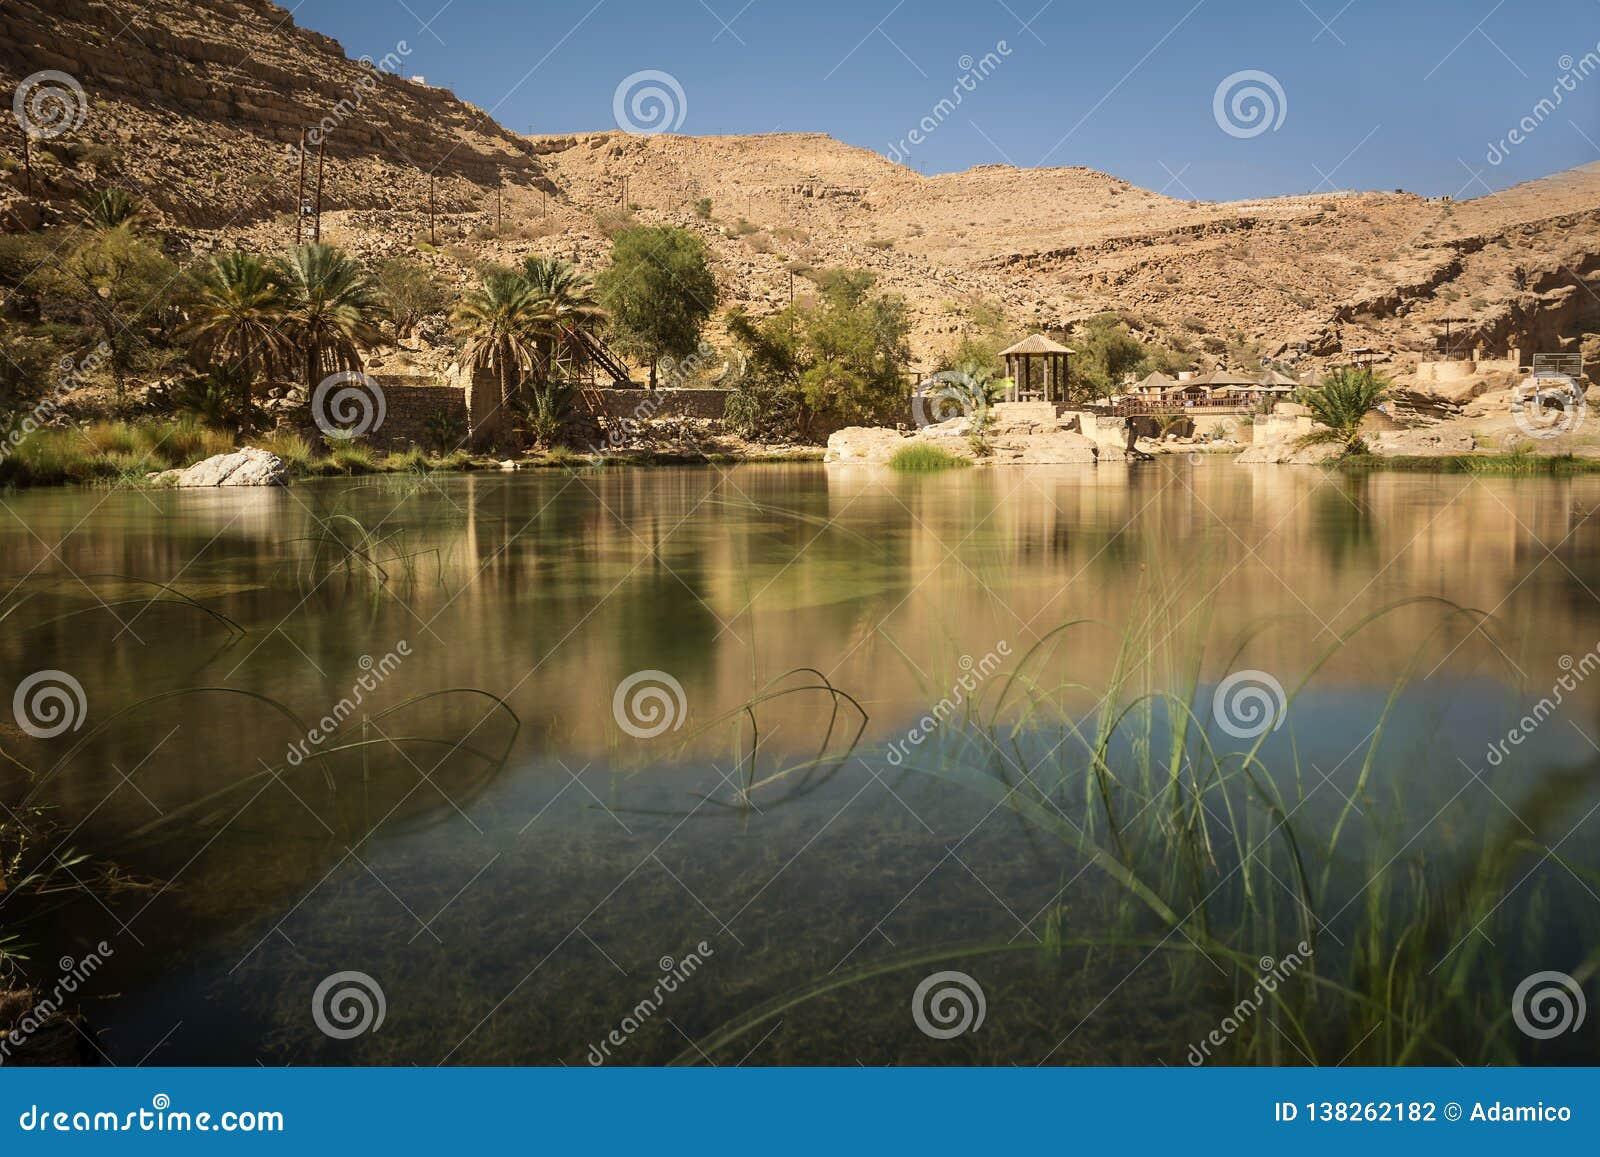 Amazing Lake and oasis with palm trees Wadi Bani Khalid in the Omani desert